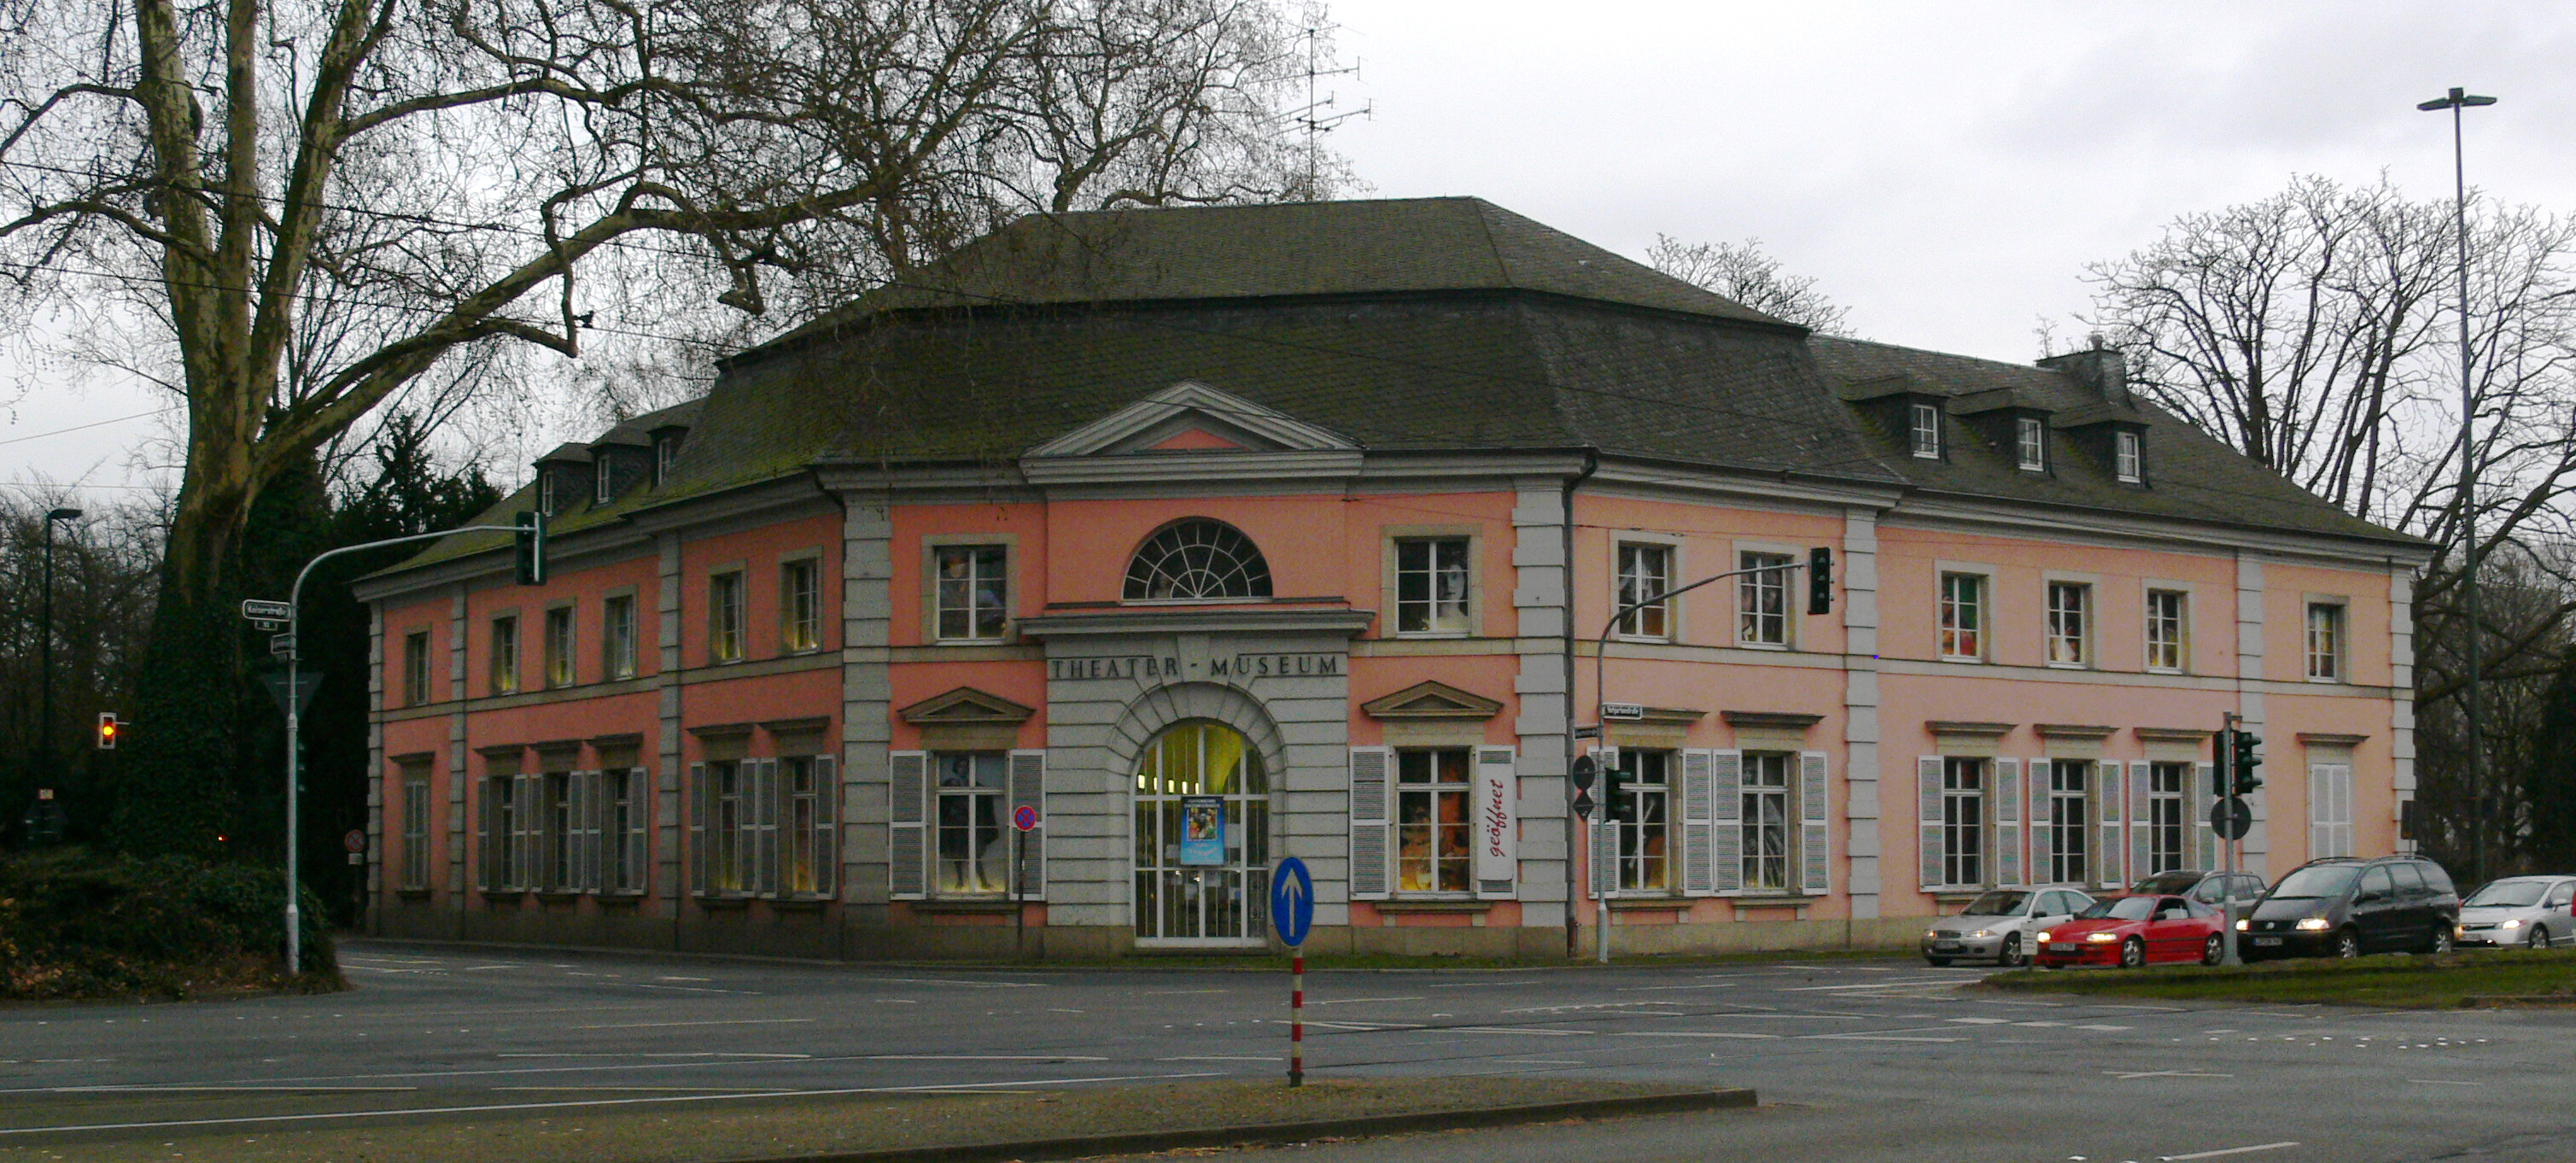 Düsseldorf Theatermuseum.jpg